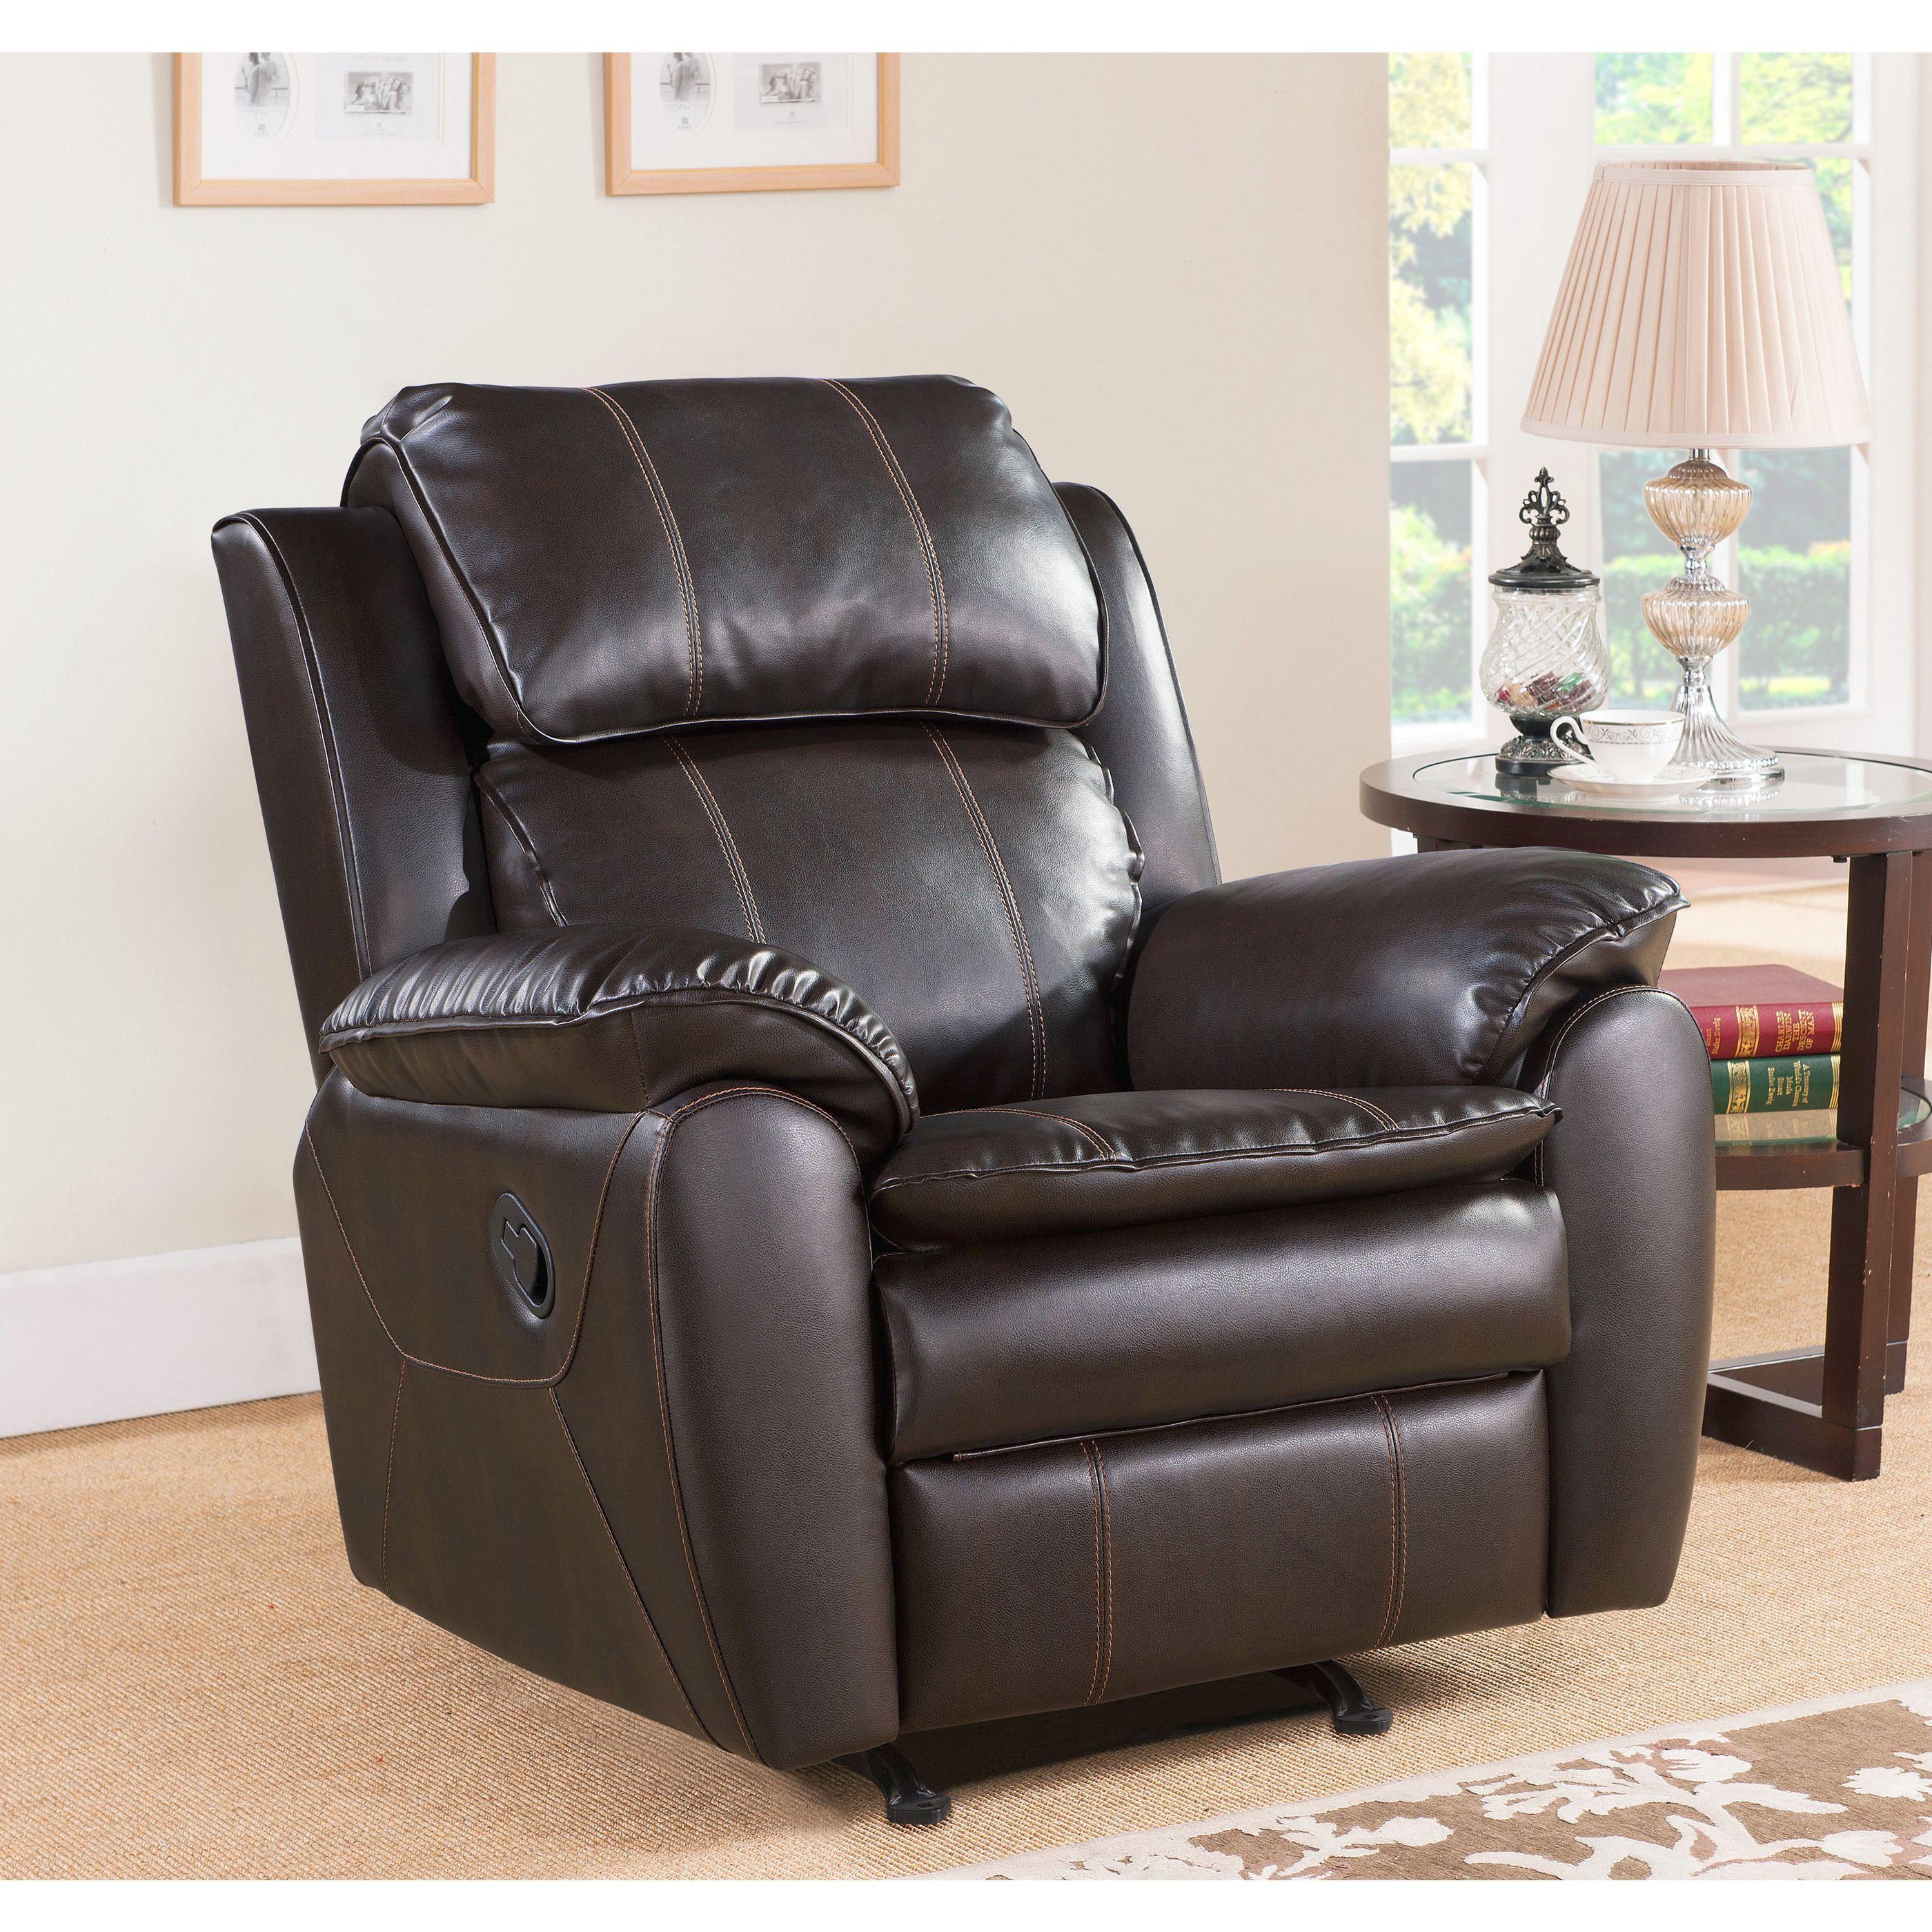 Abbyson Living Harbor Dark Brown Leather Rocker Recliner Chair